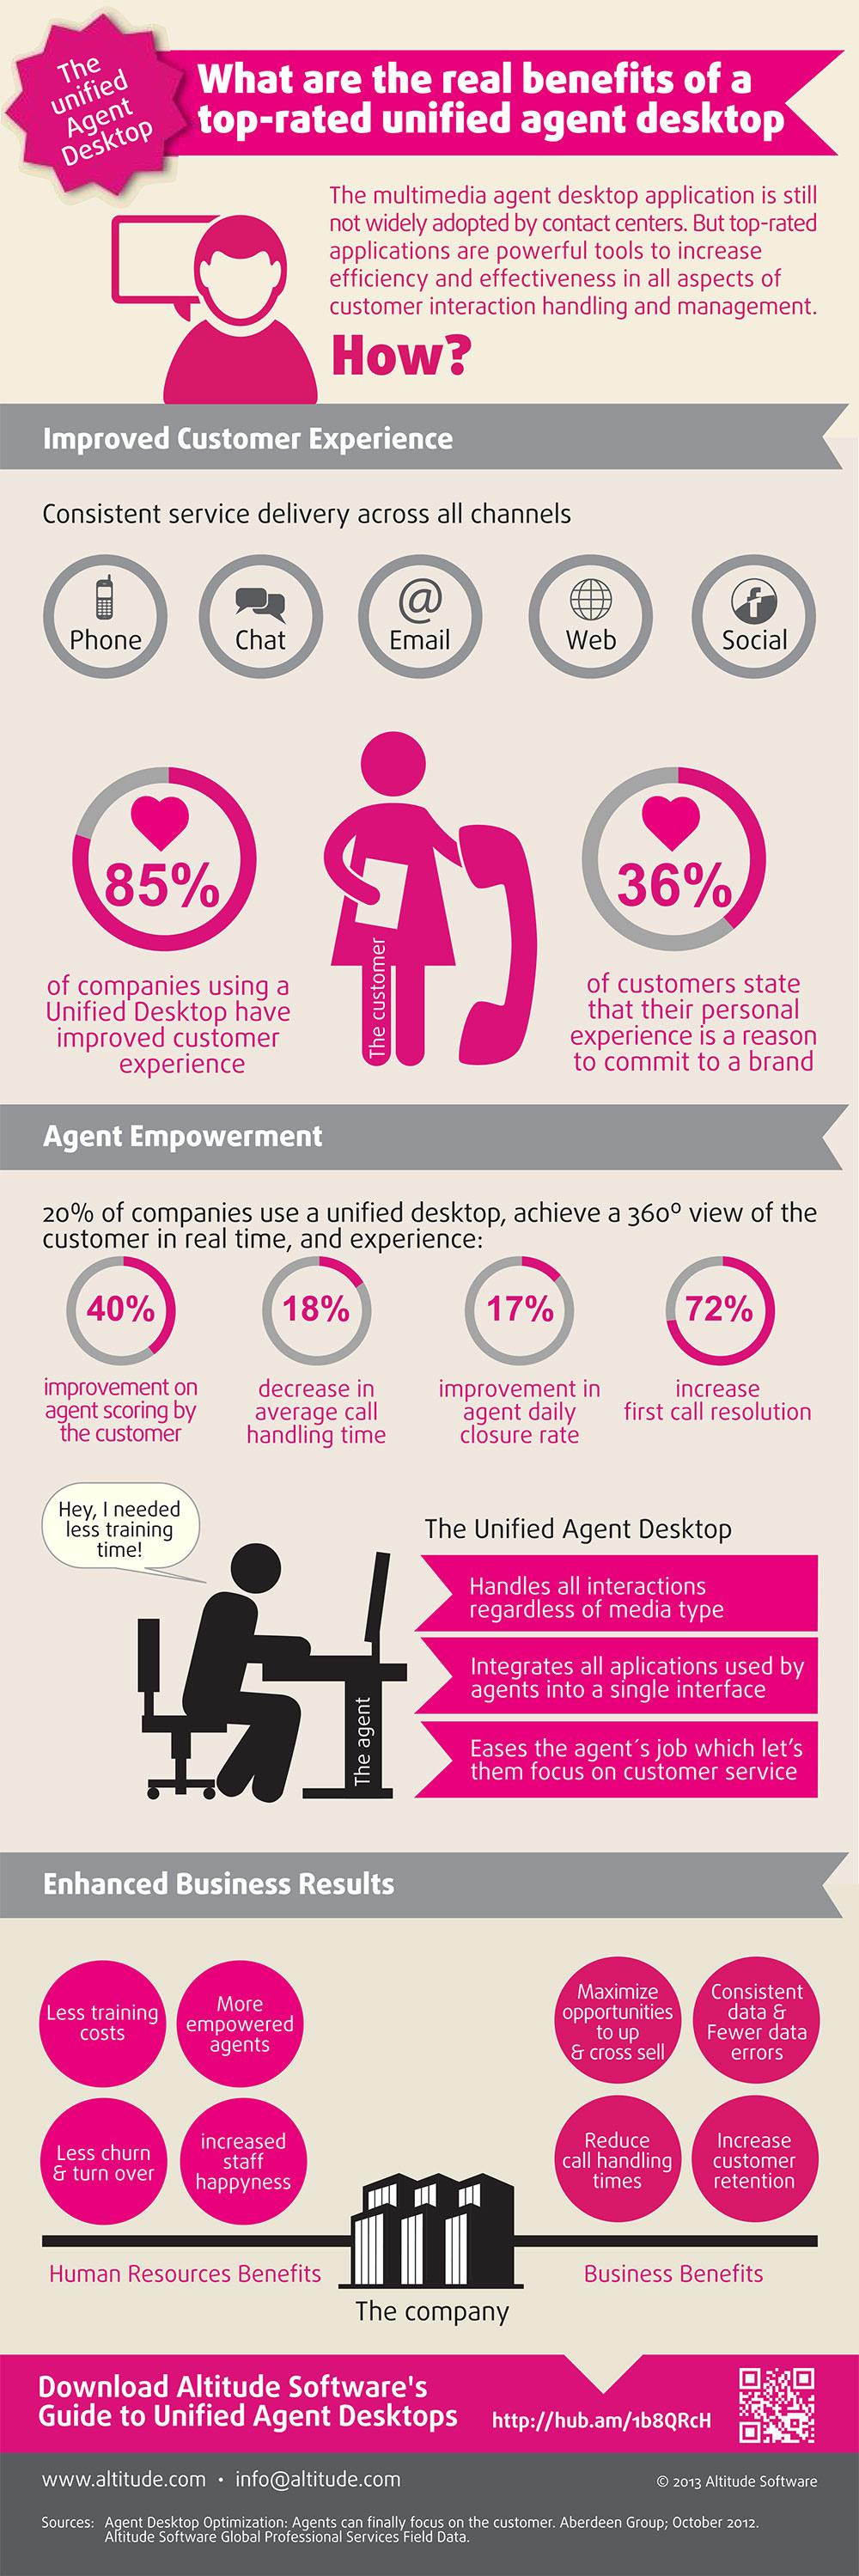 Altitude Software Unified Desktop Infographic